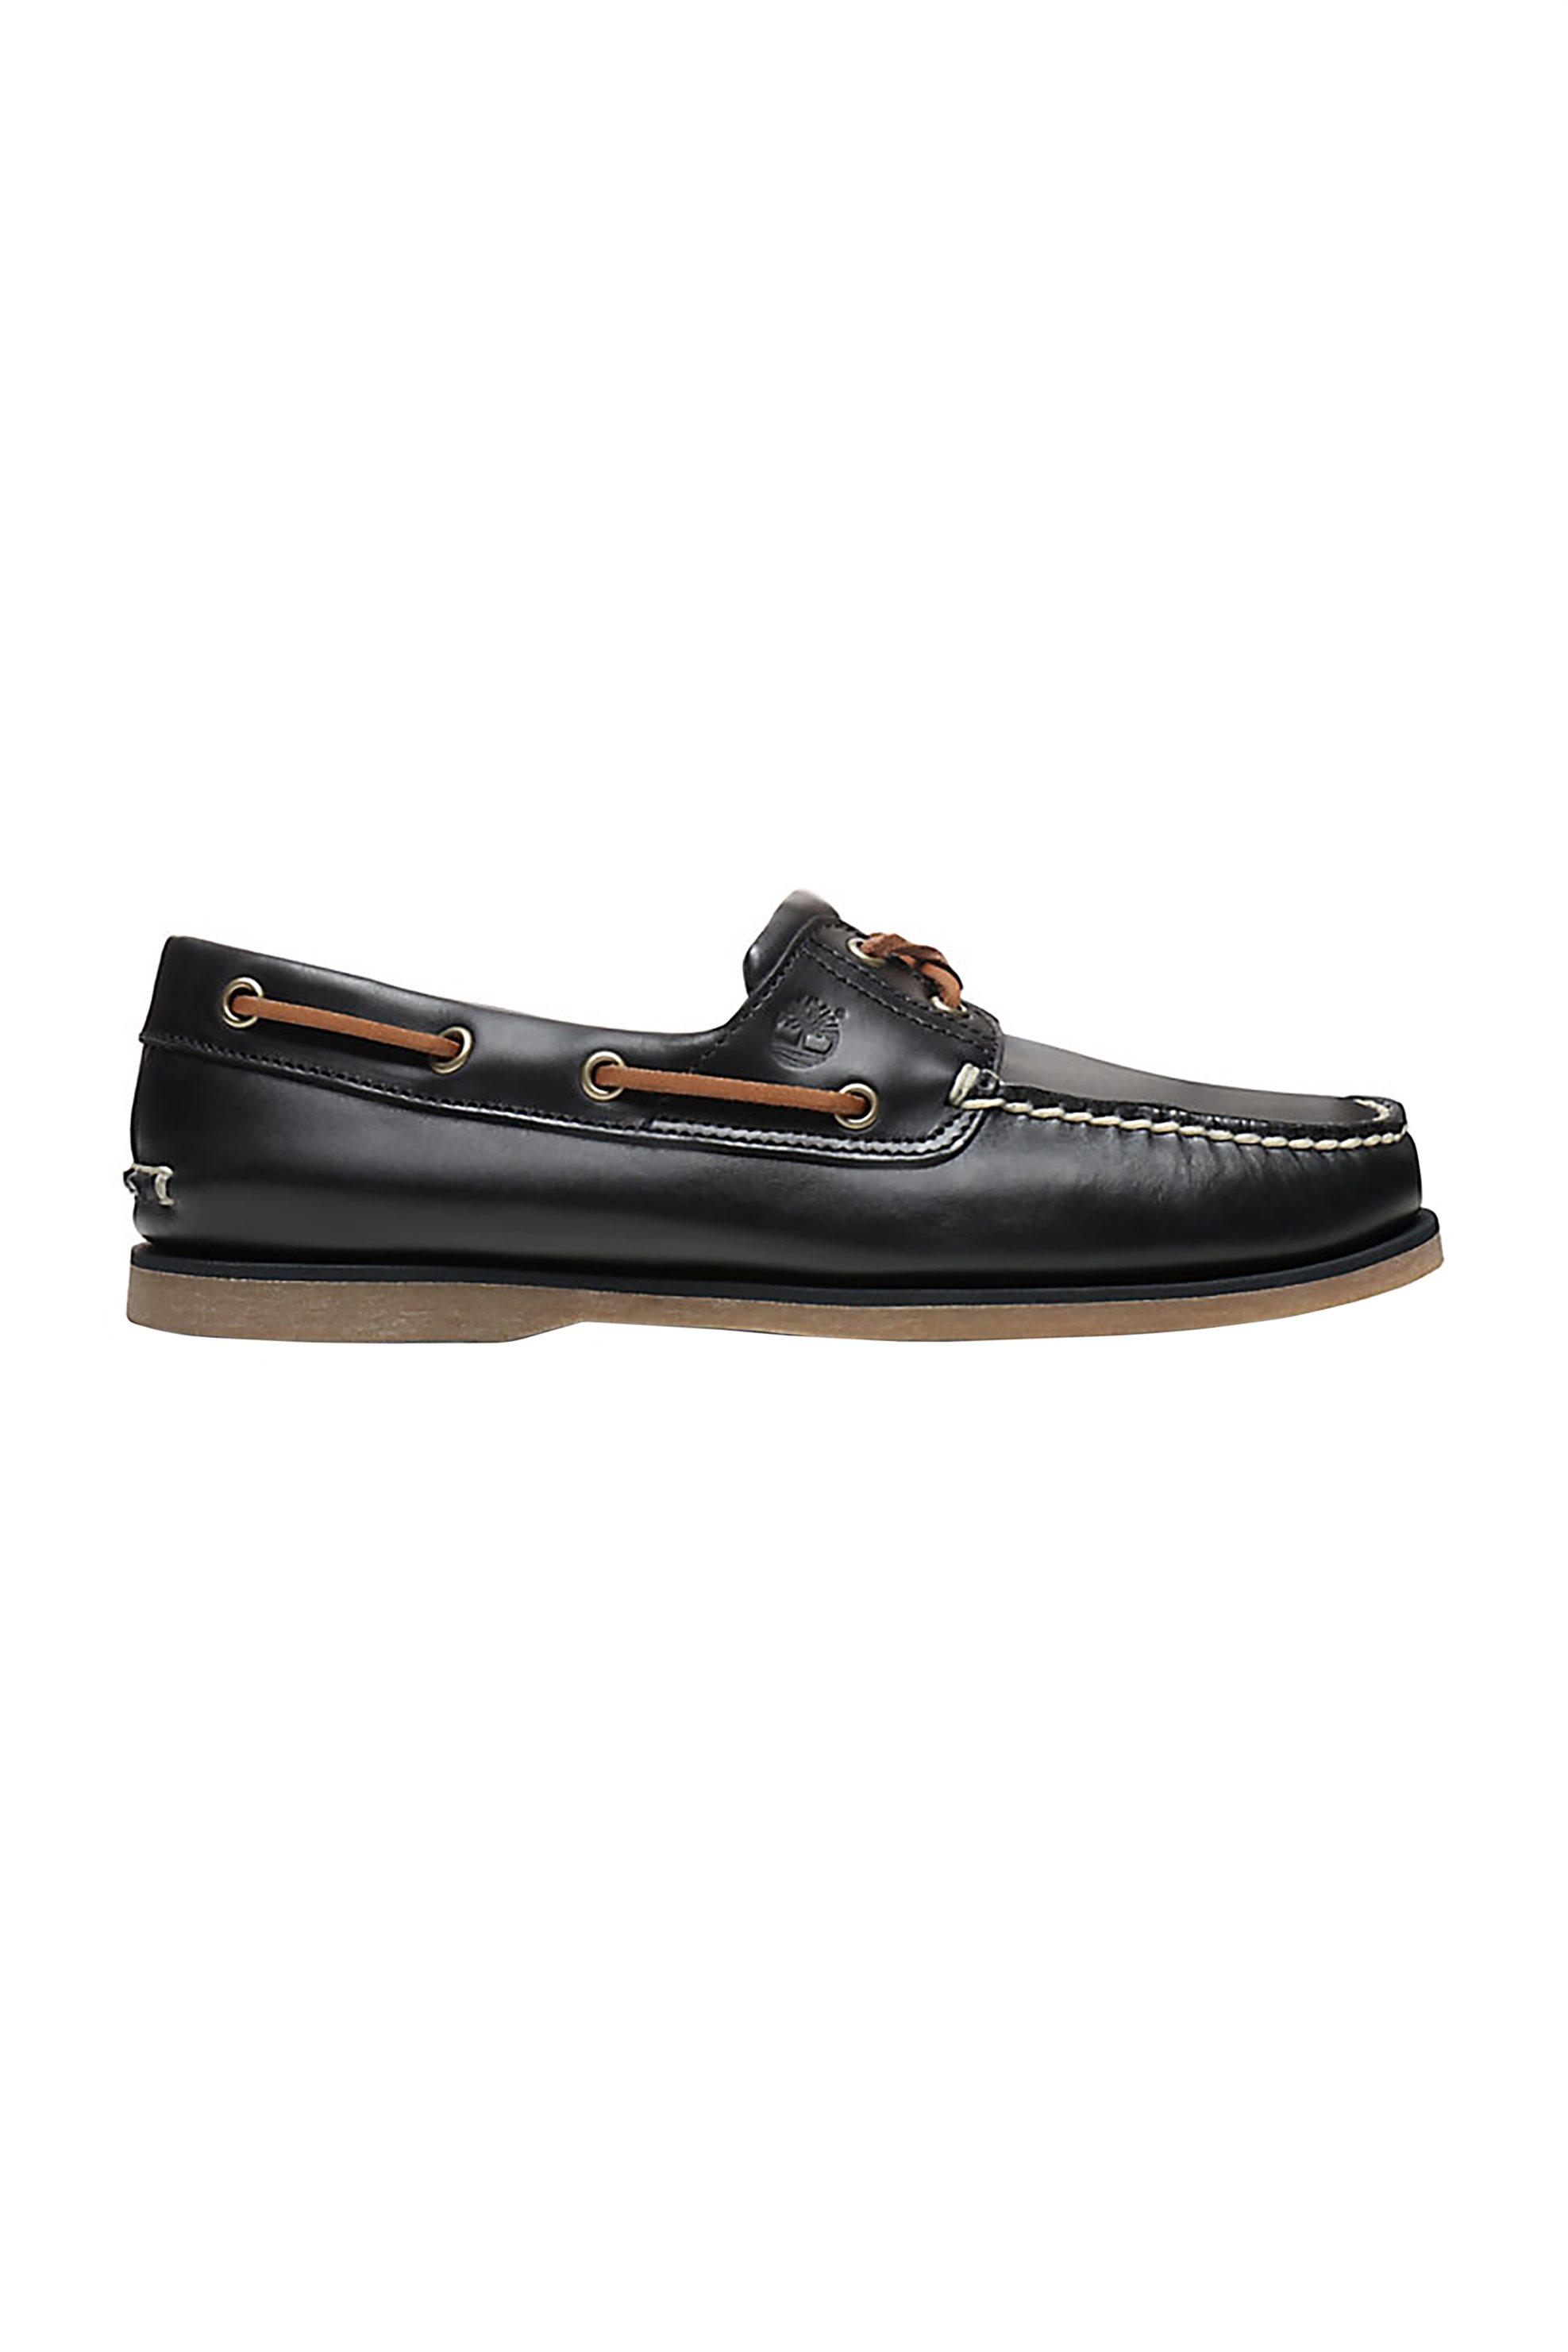 3695cc4392b Notos Timberland ανδρικά boat shoes Classic 2-Eye – TB0A232M4031 – Μπλε  Σκούρο